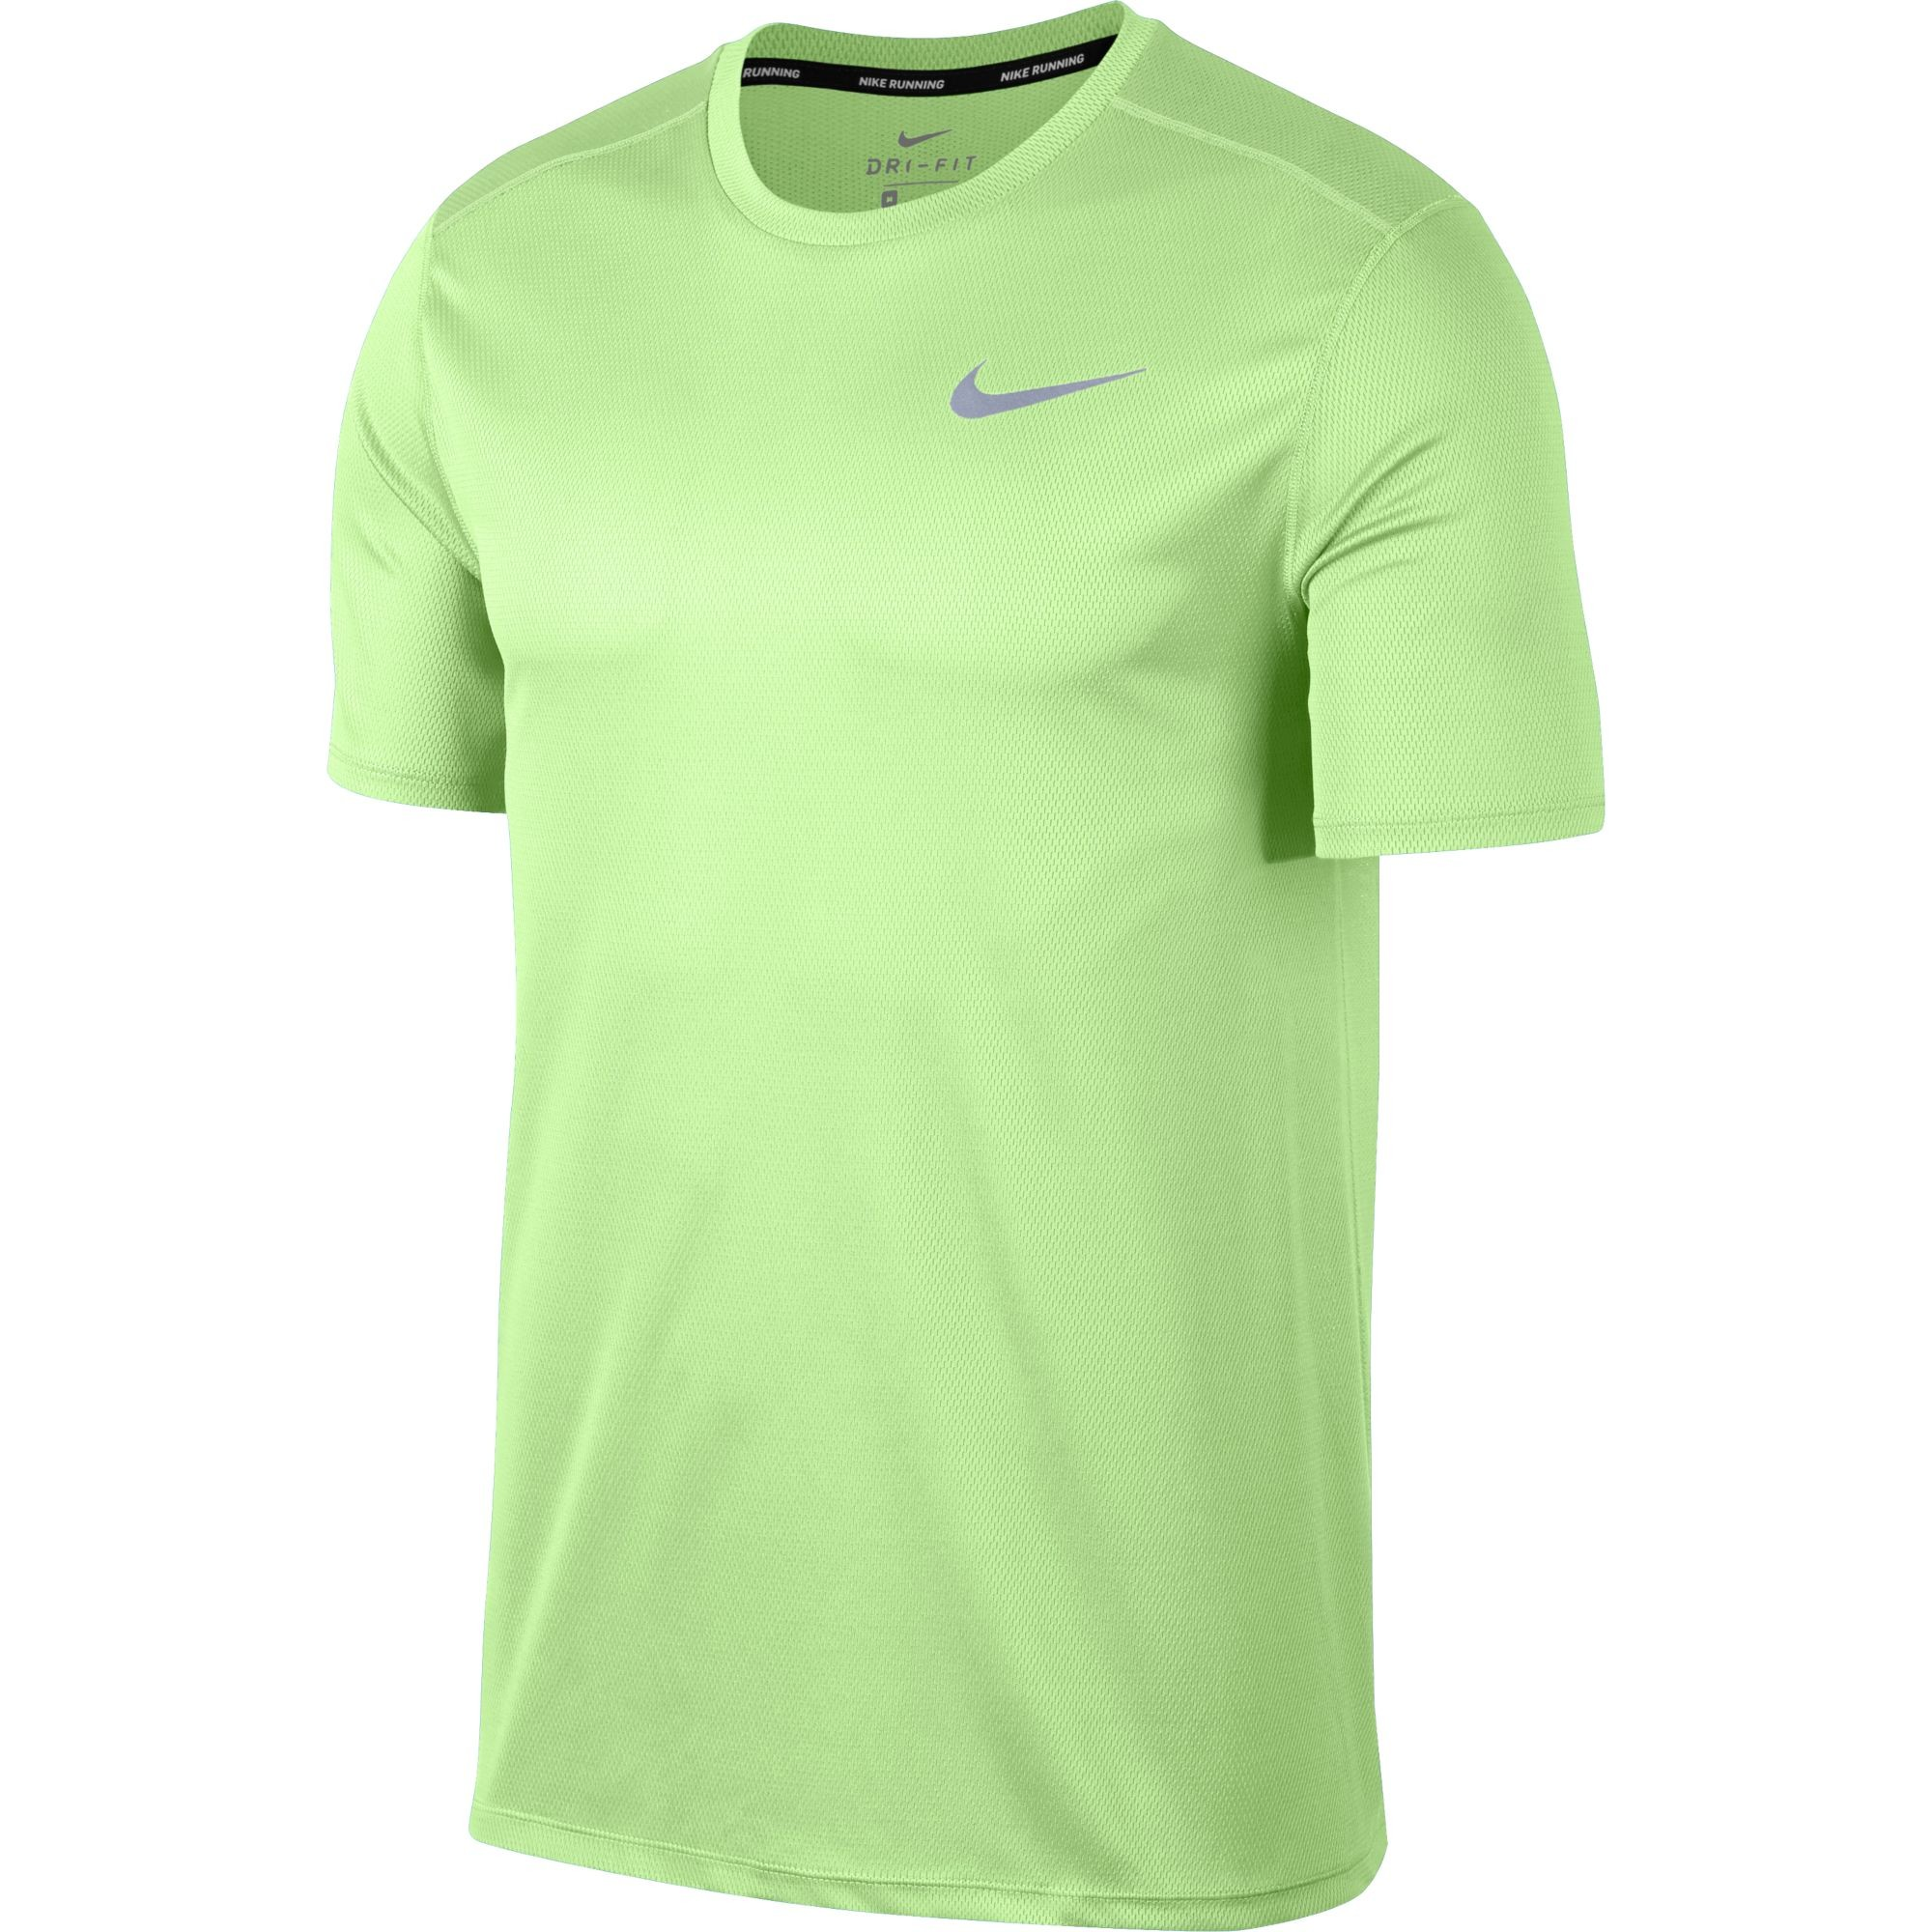 Camiseta Nike Brthe Run 904634 701 - Deportes Manzanedo